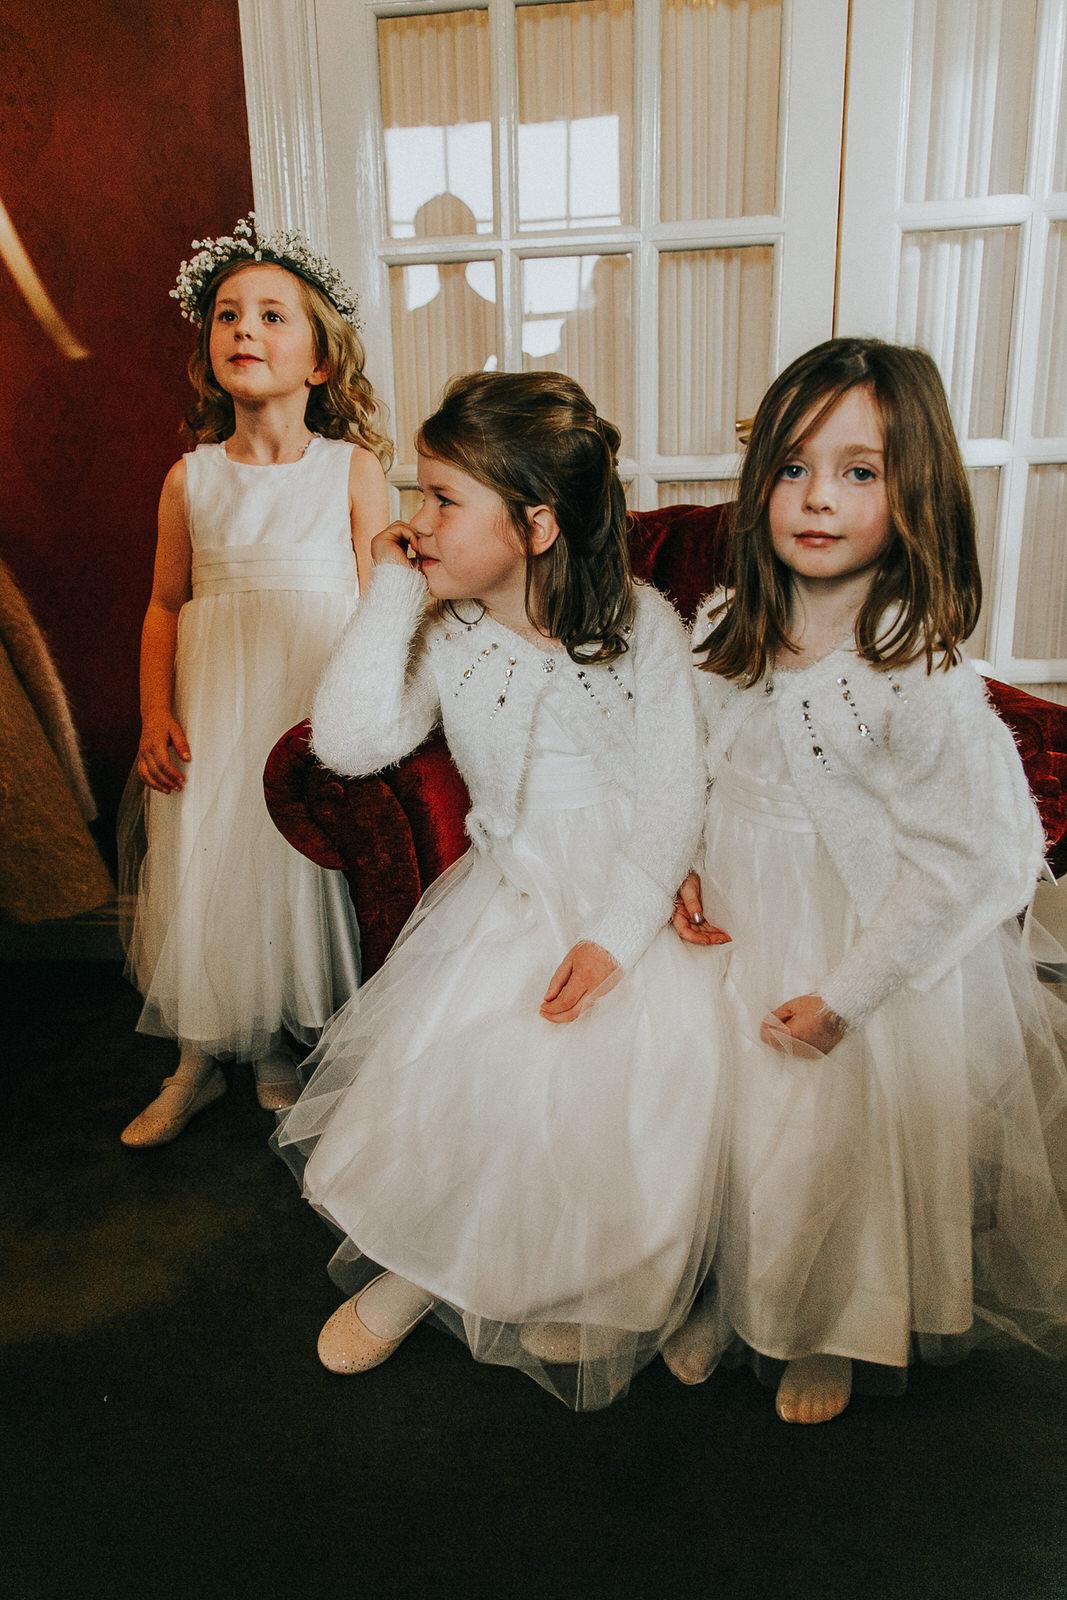 Dunbrody_House_Wedding_photographer_024.jpg